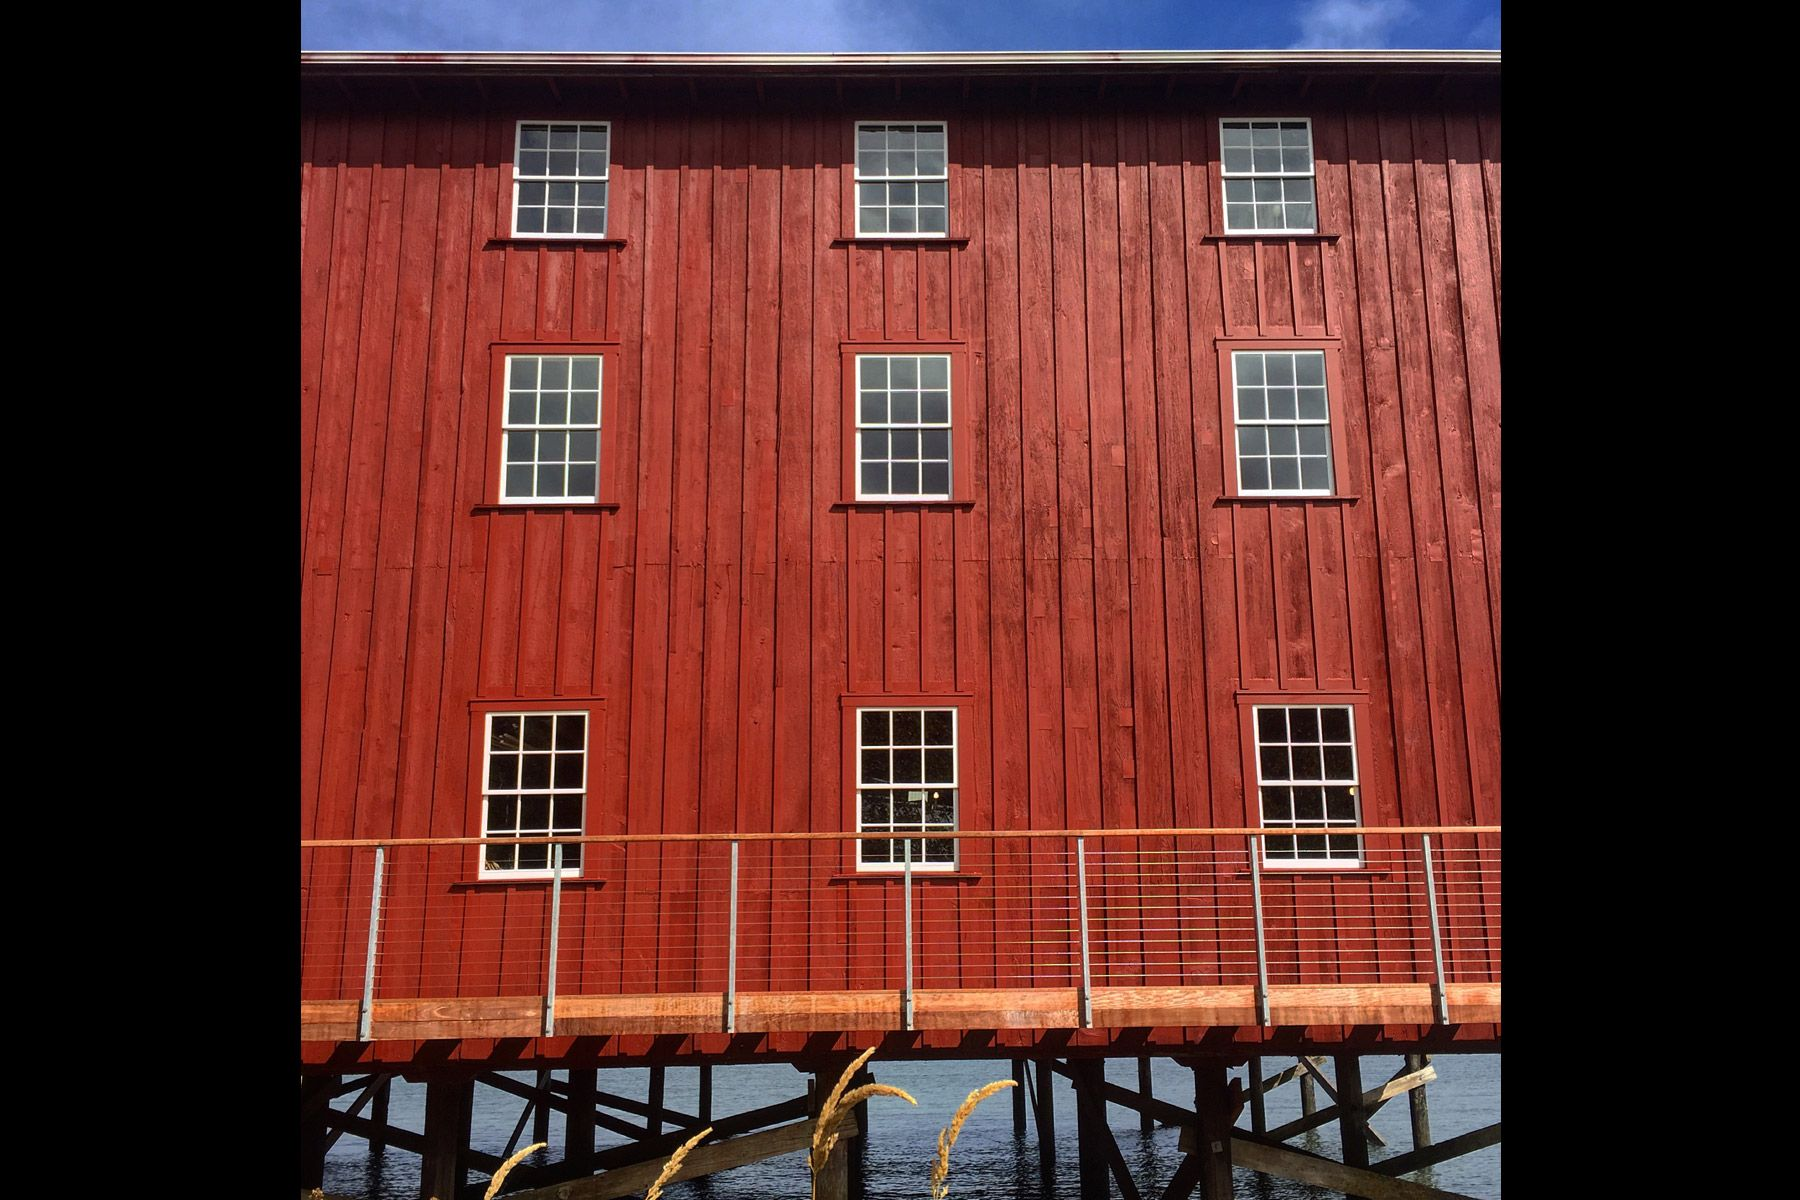 red barn, custom, astoria, river, fenestration, cannery